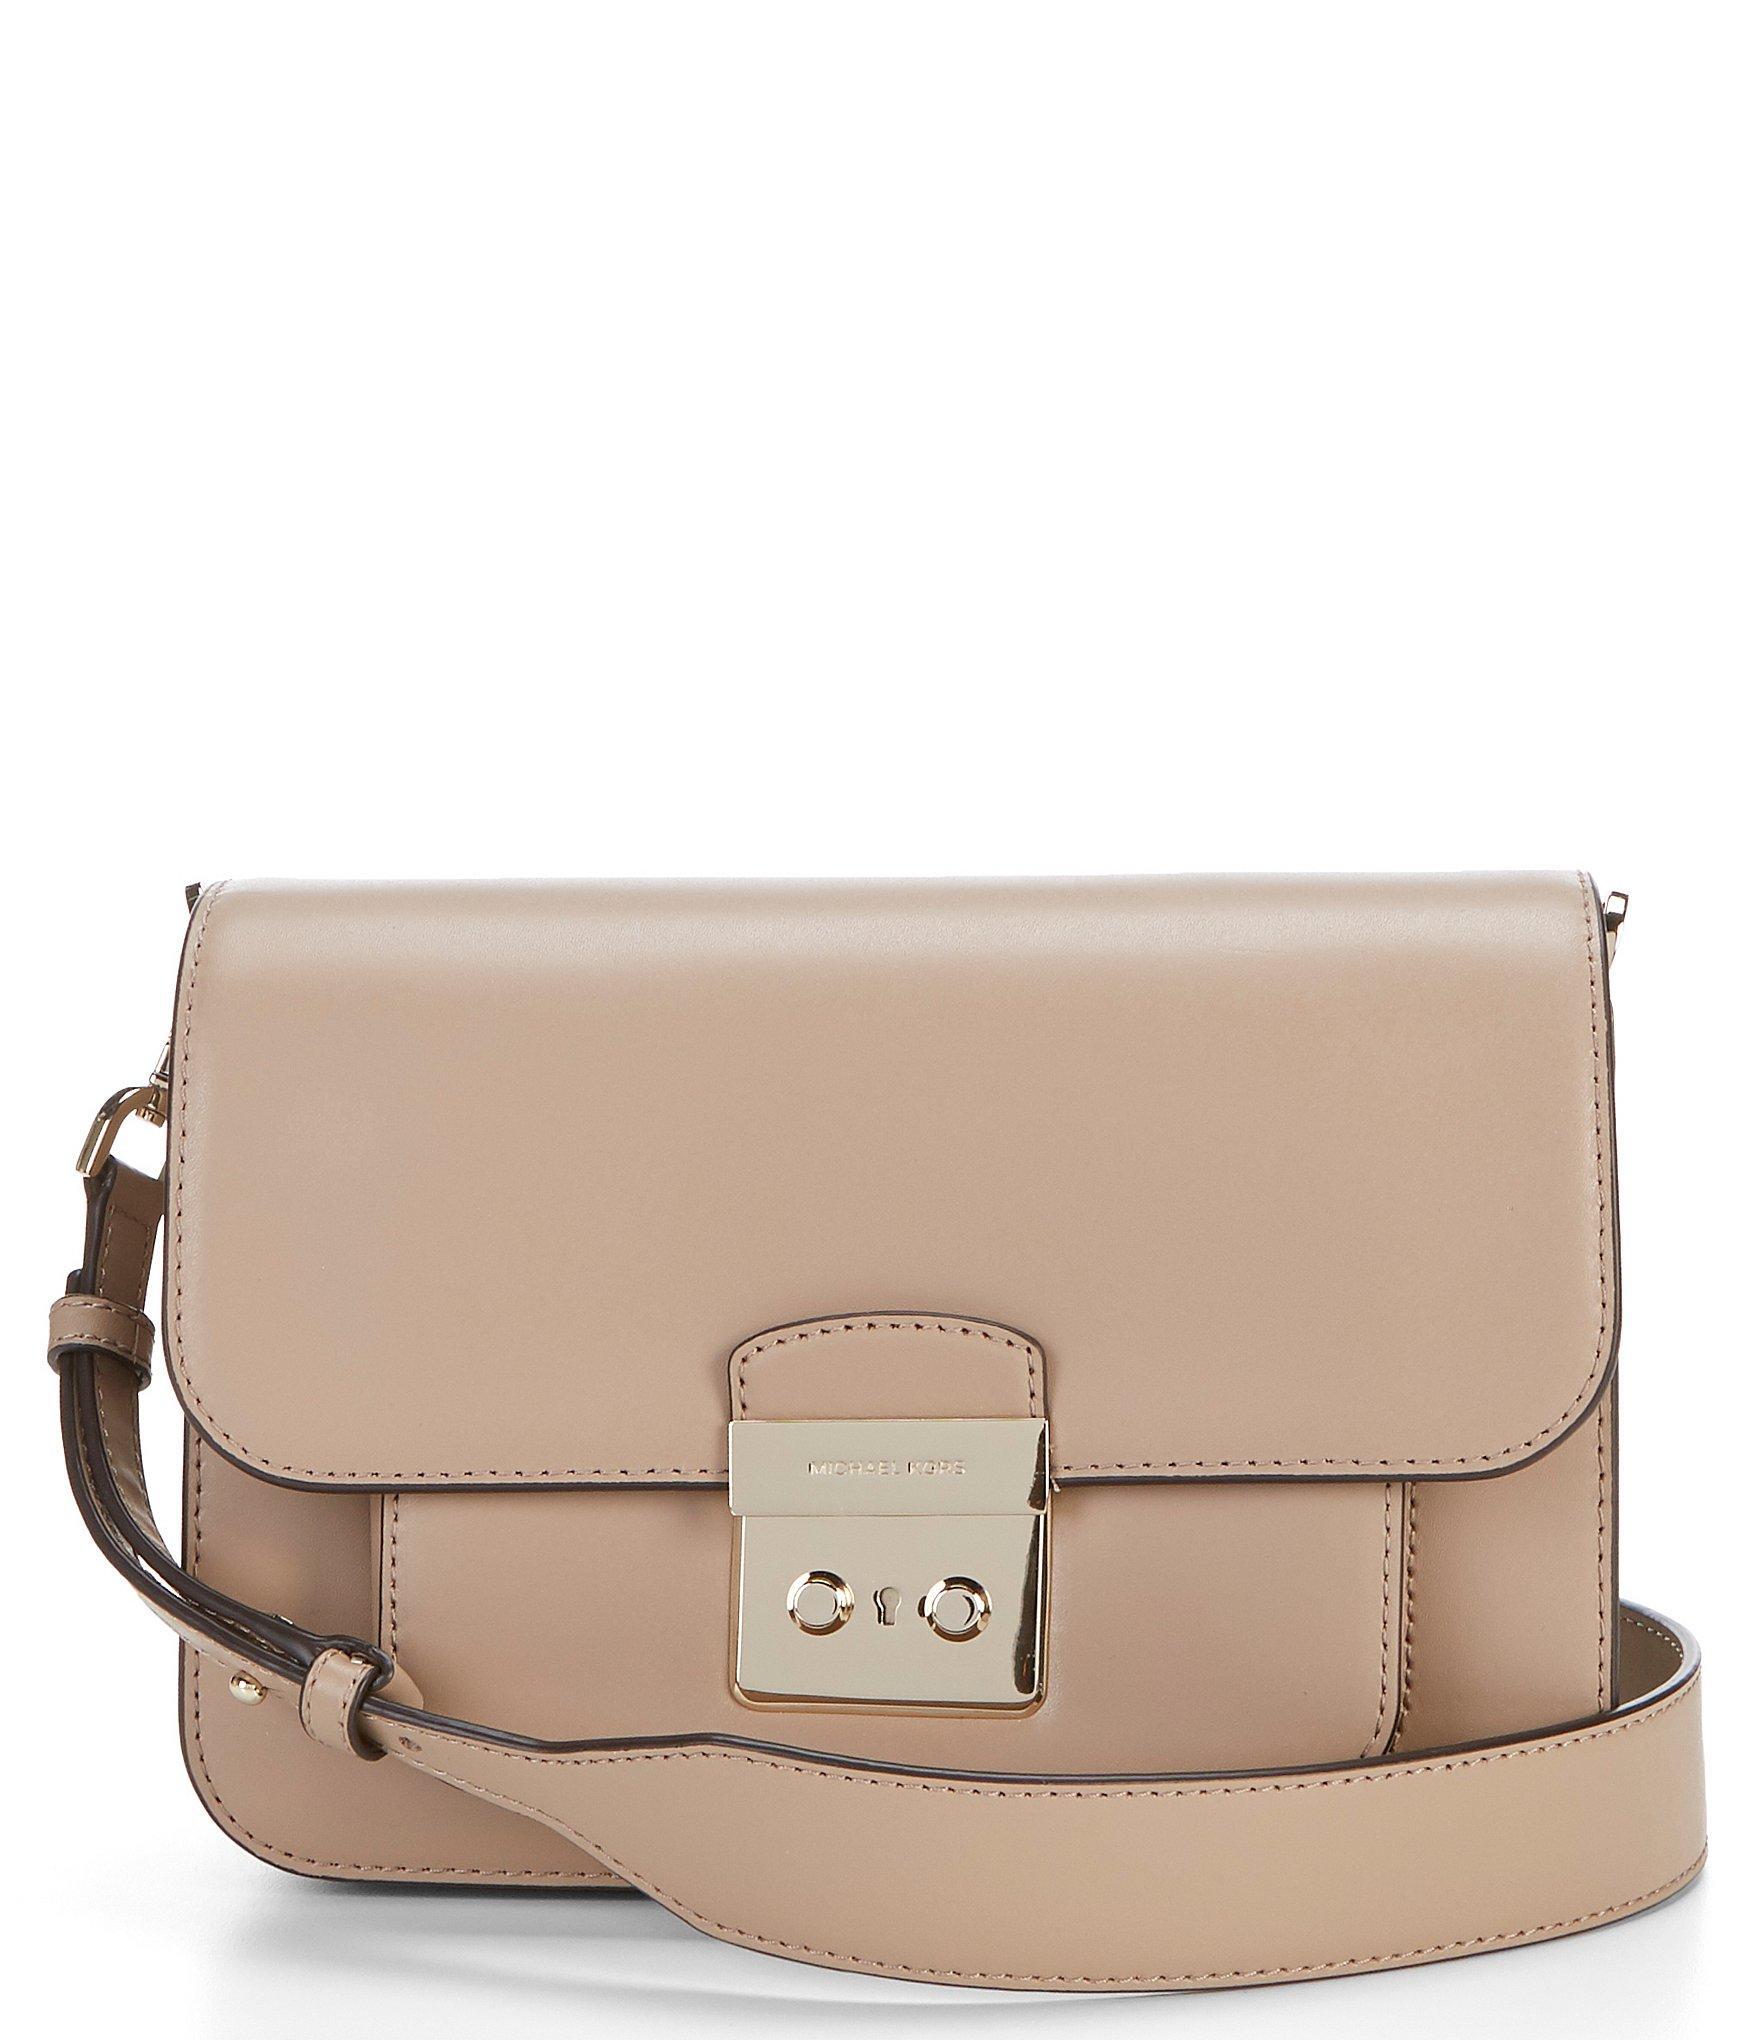 cf1d9633cd3d Lyst - MICHAEL Michael Kors Sloan Shoulder Bag - Save 25%